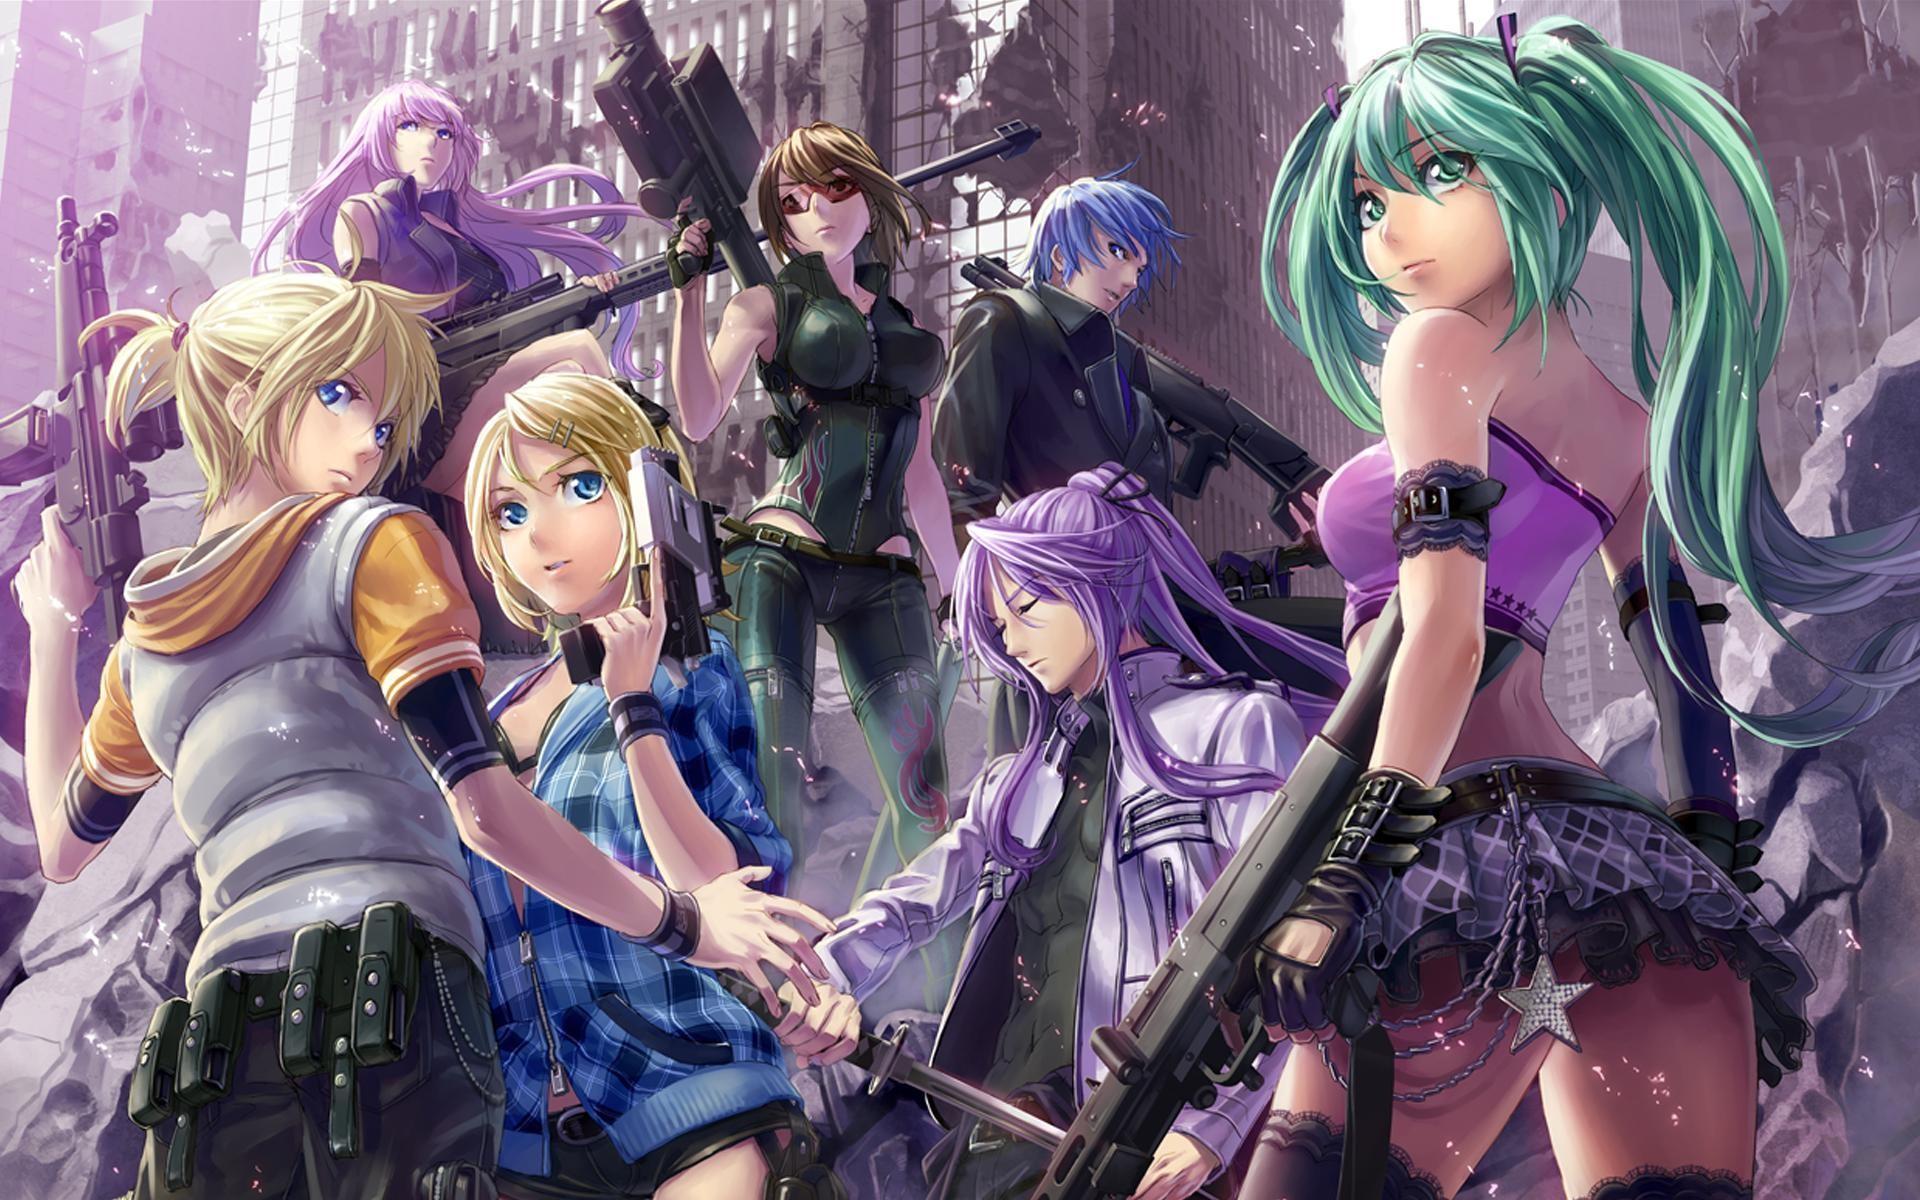 Vocaloid Free Download For Windows 7 - lecrise